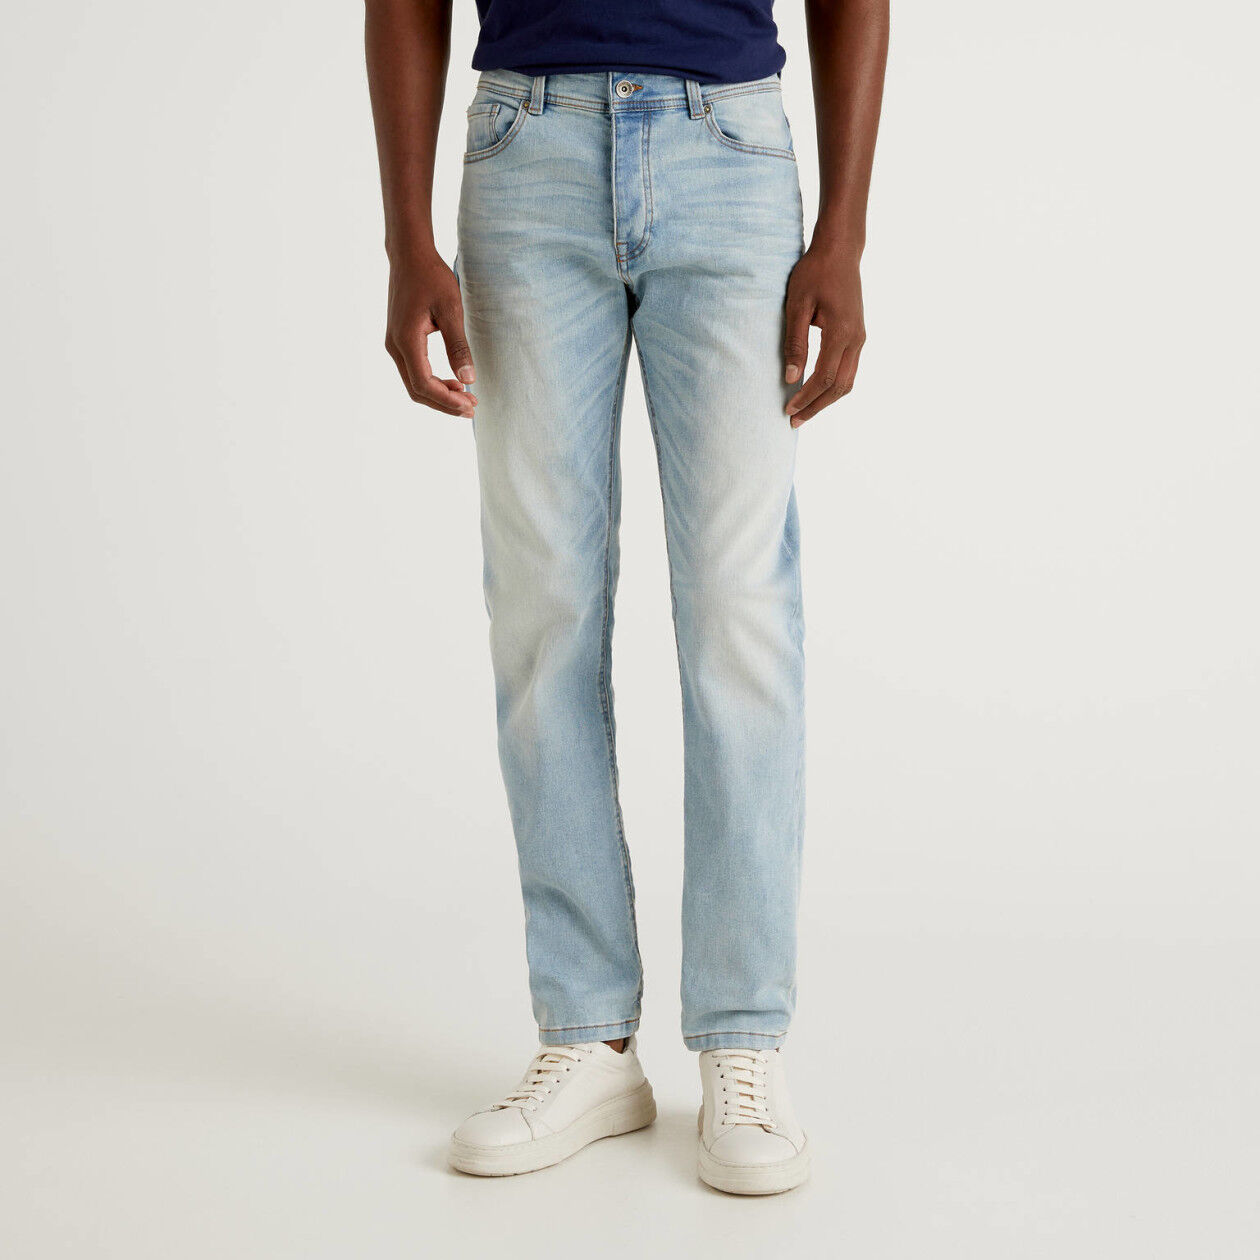 Jeans slim fit cinco bolsos